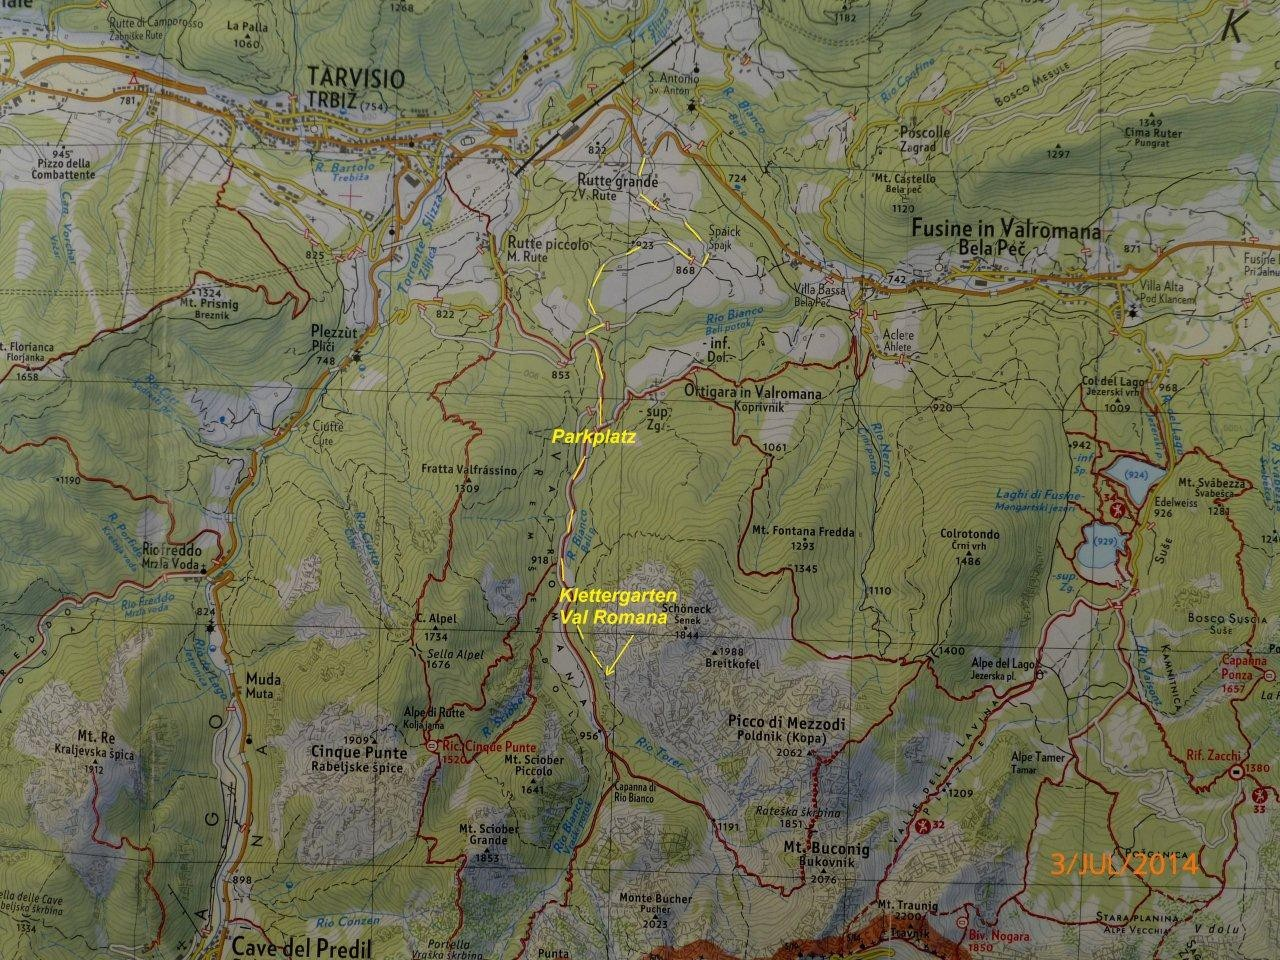 Lage Klettergarten im Val Romana